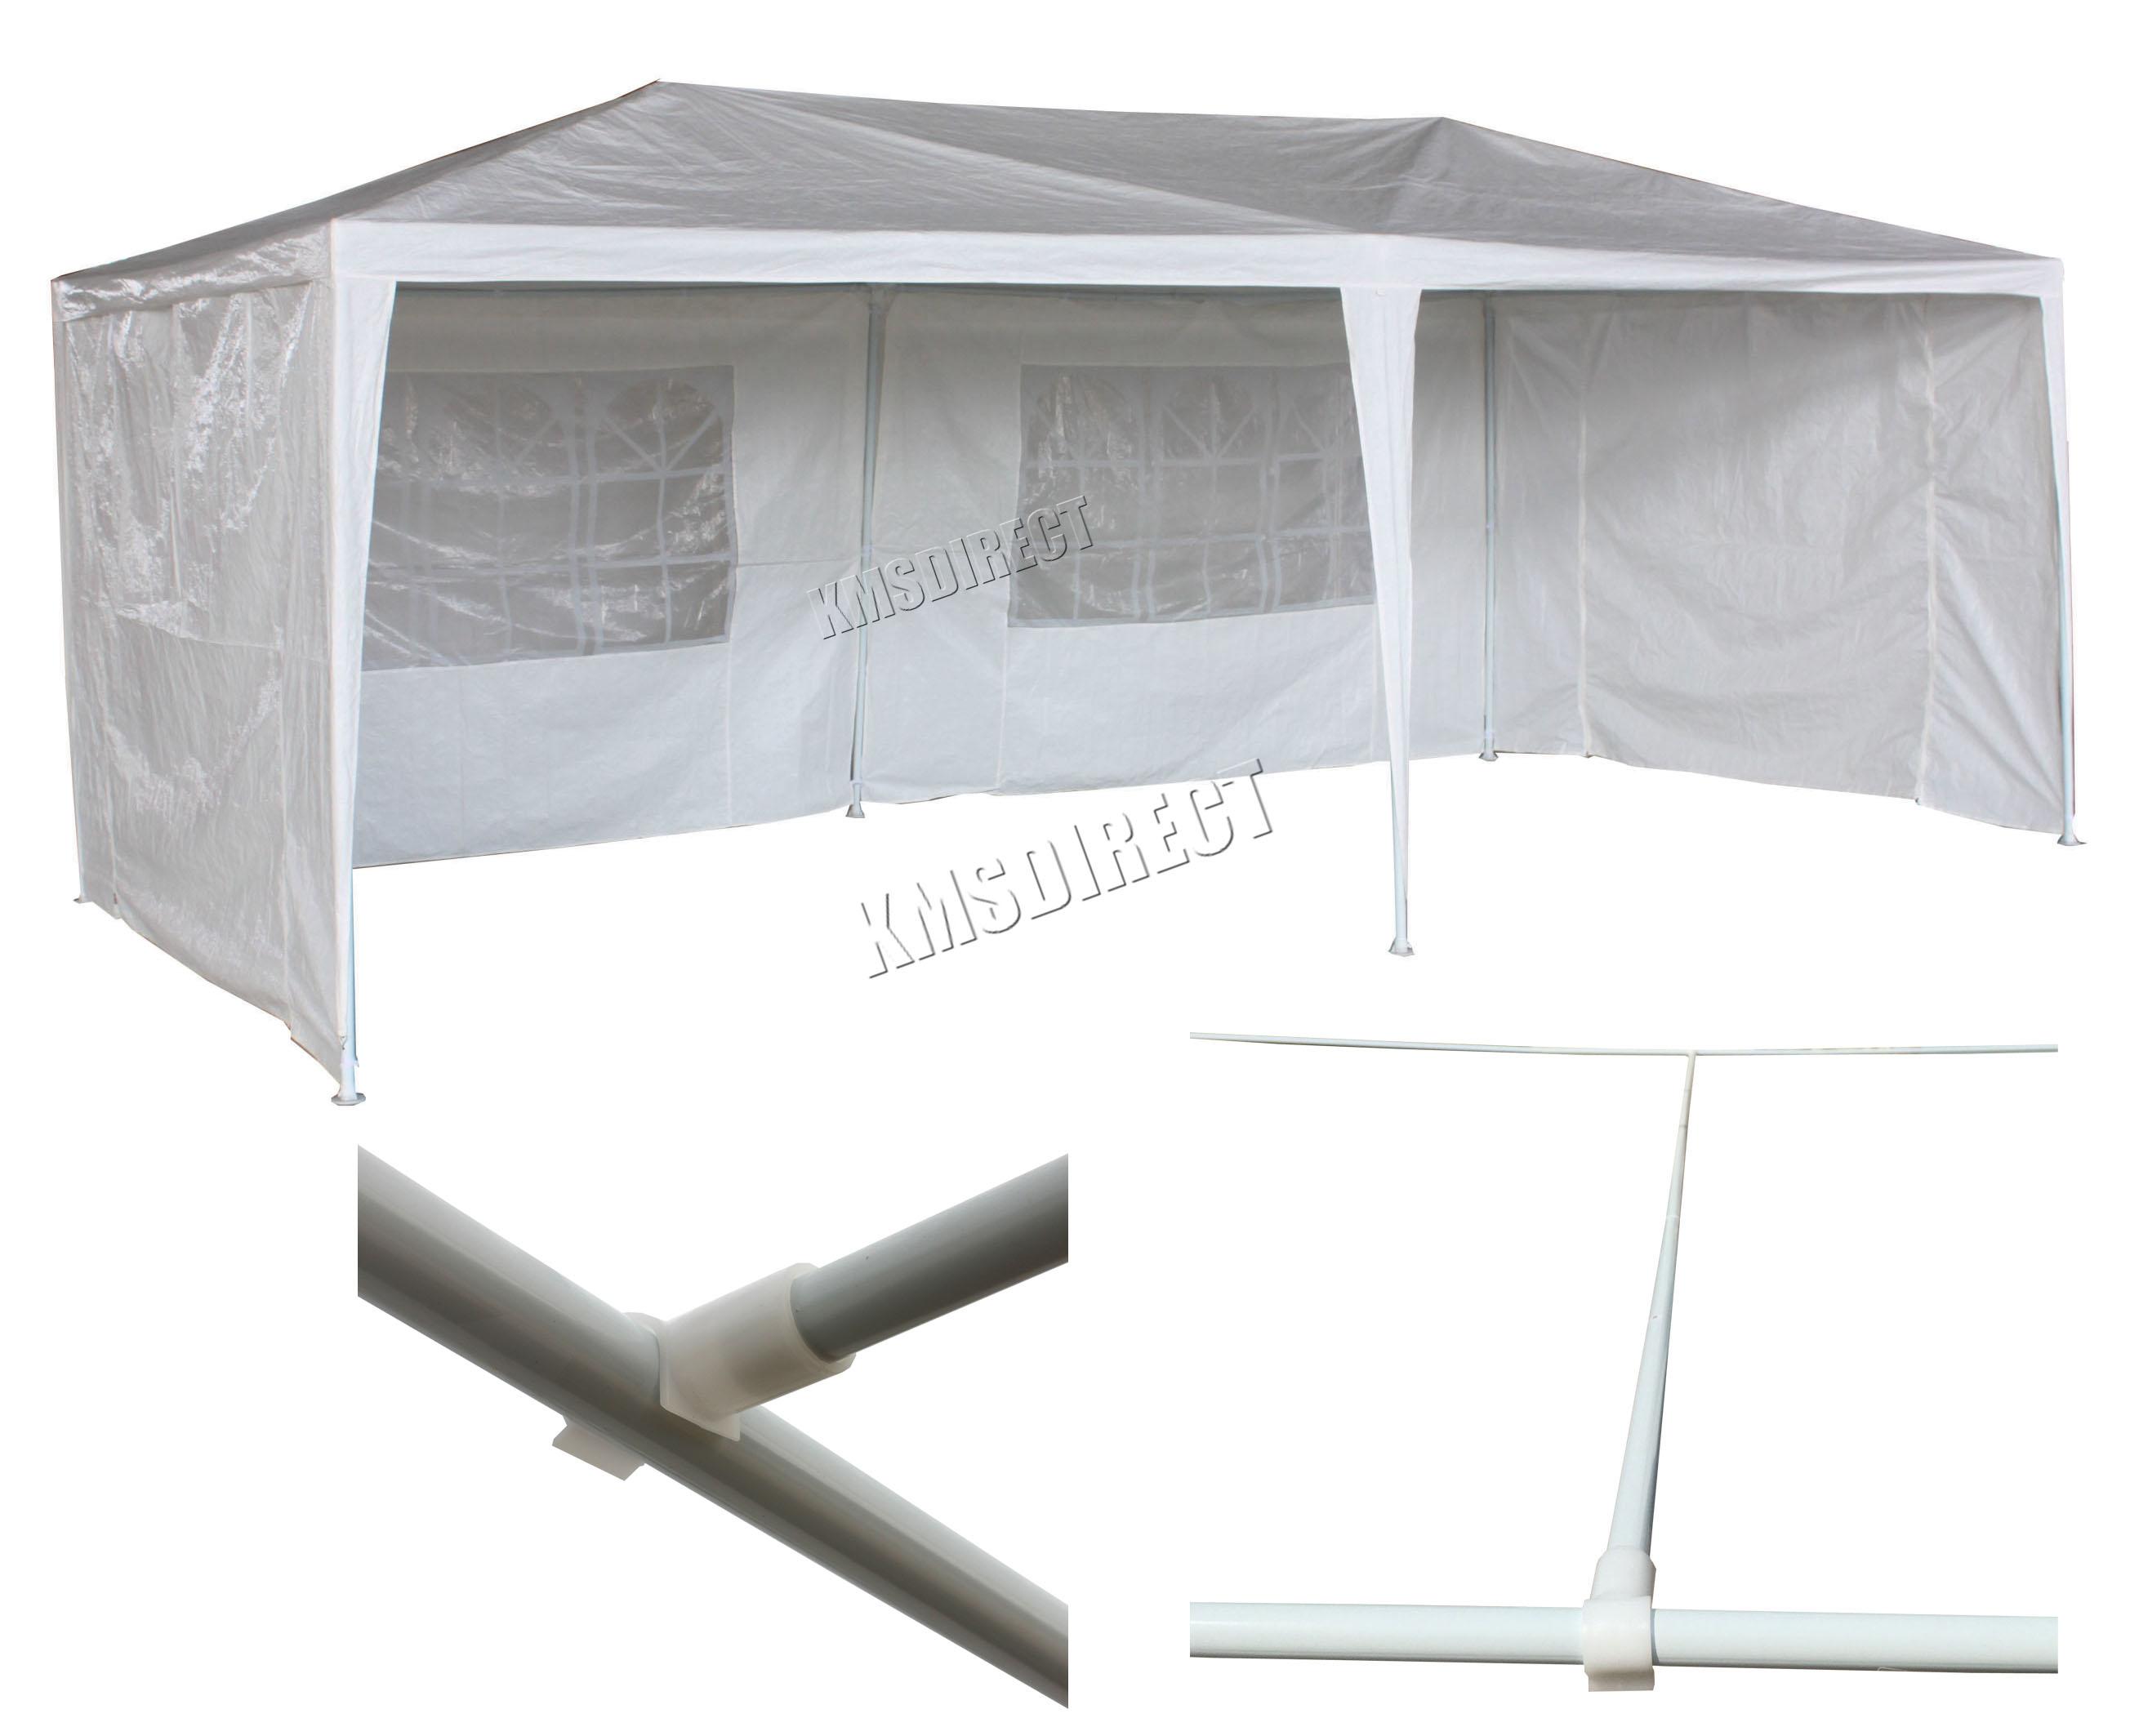 Sentinel 3m X 6m White Waterproof Outdoor Garden Gazebo Party Tent Marquee 2 SUPPORT BEAM